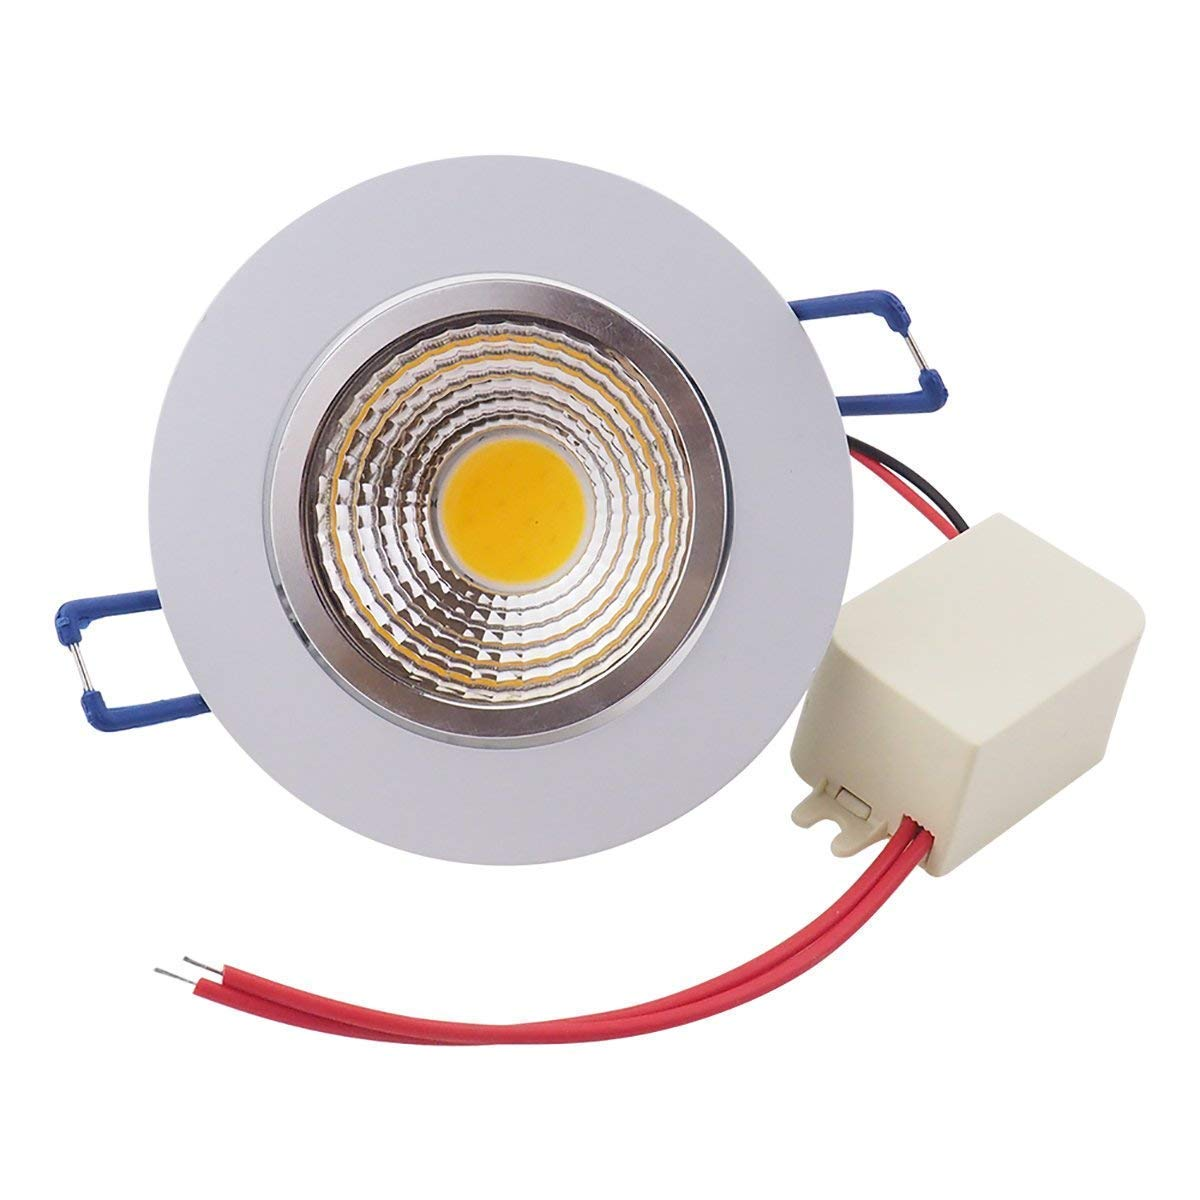 POCKETMAN 10 Pack 7W 700LM LED COB Recessed Ceiling Downlights,3000K Warm White Ceiling Lights Spotlights,Angle Adjustable